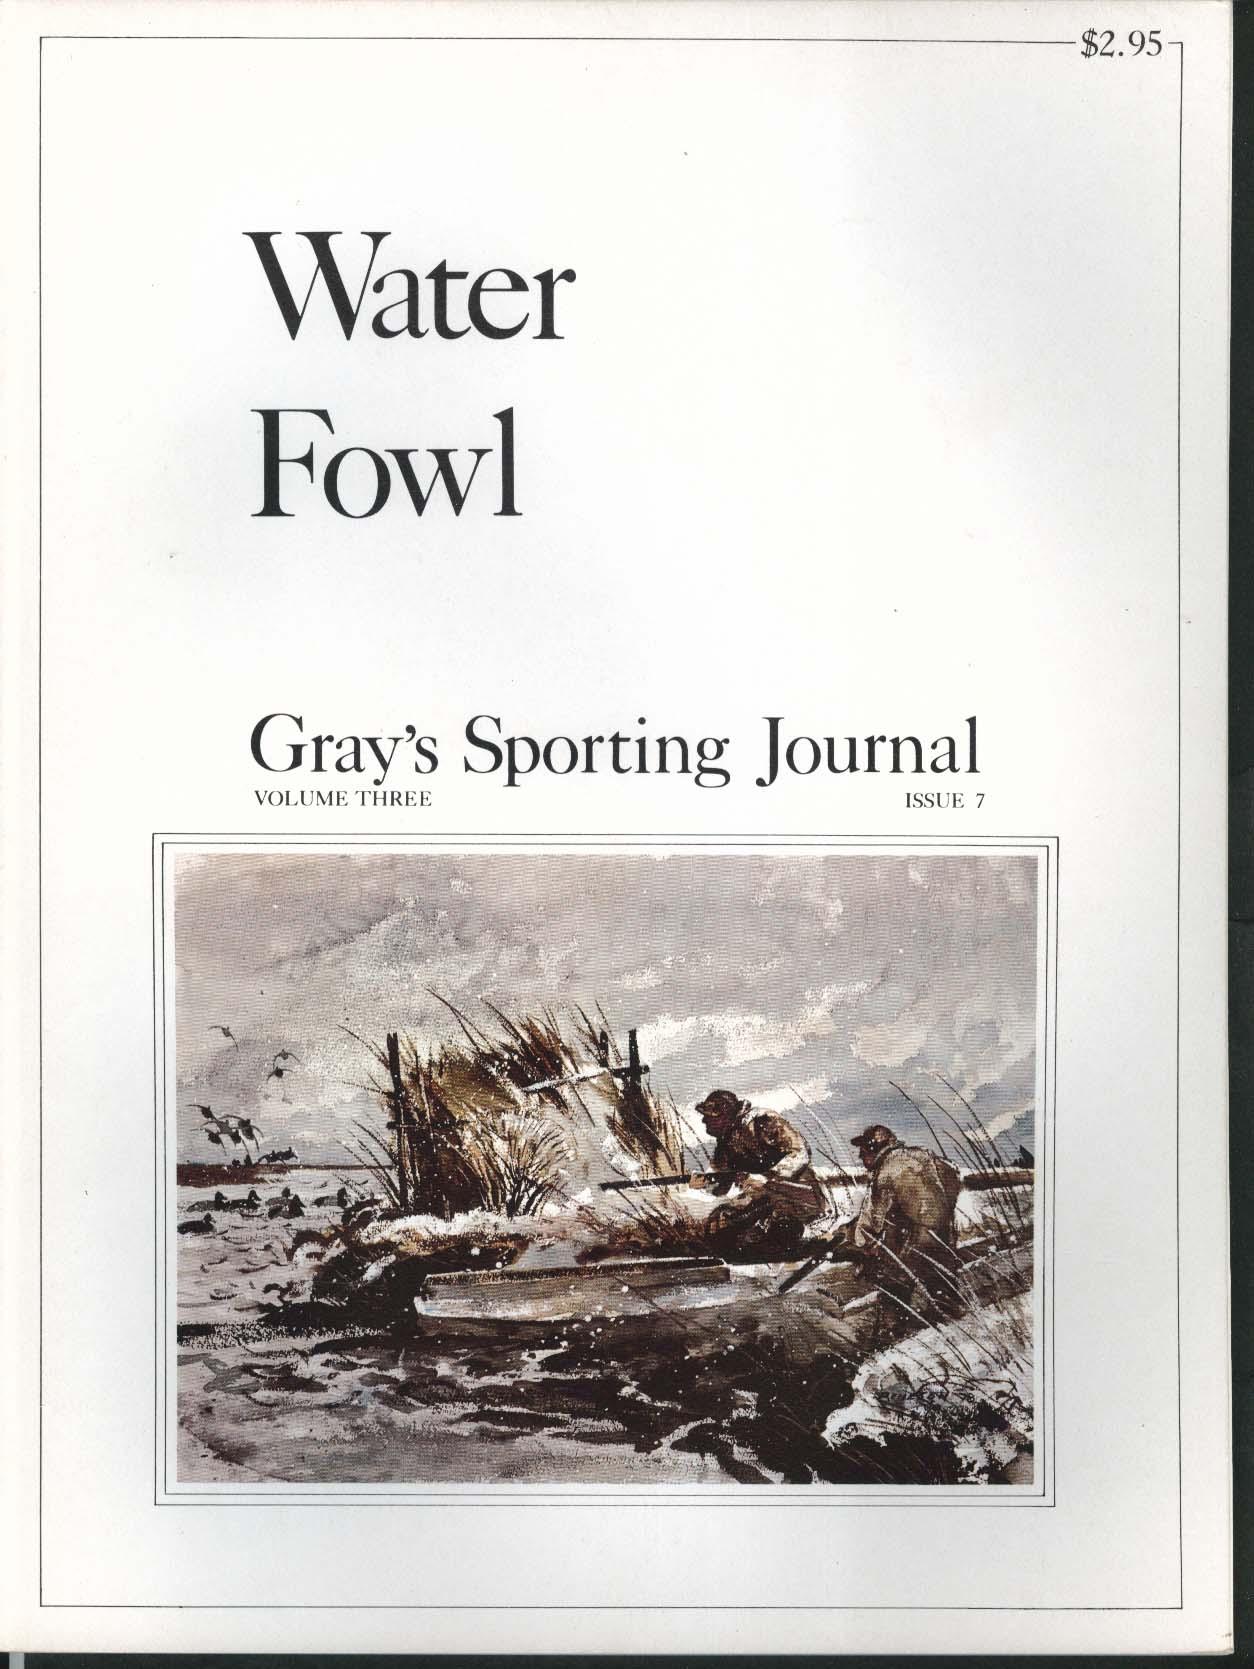 GRAY'S SPORTING JOURNAL Vol 3 #7 Water Fowl Black Brant Stewed Wild Duck 11 1978